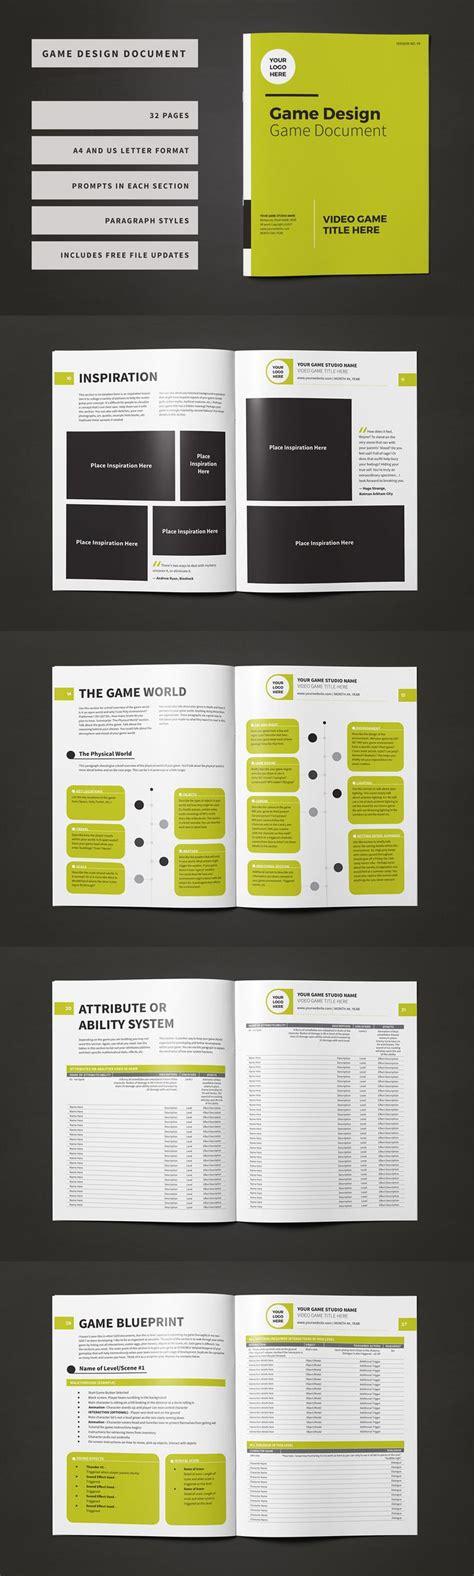 game design document template ideas  pinterest